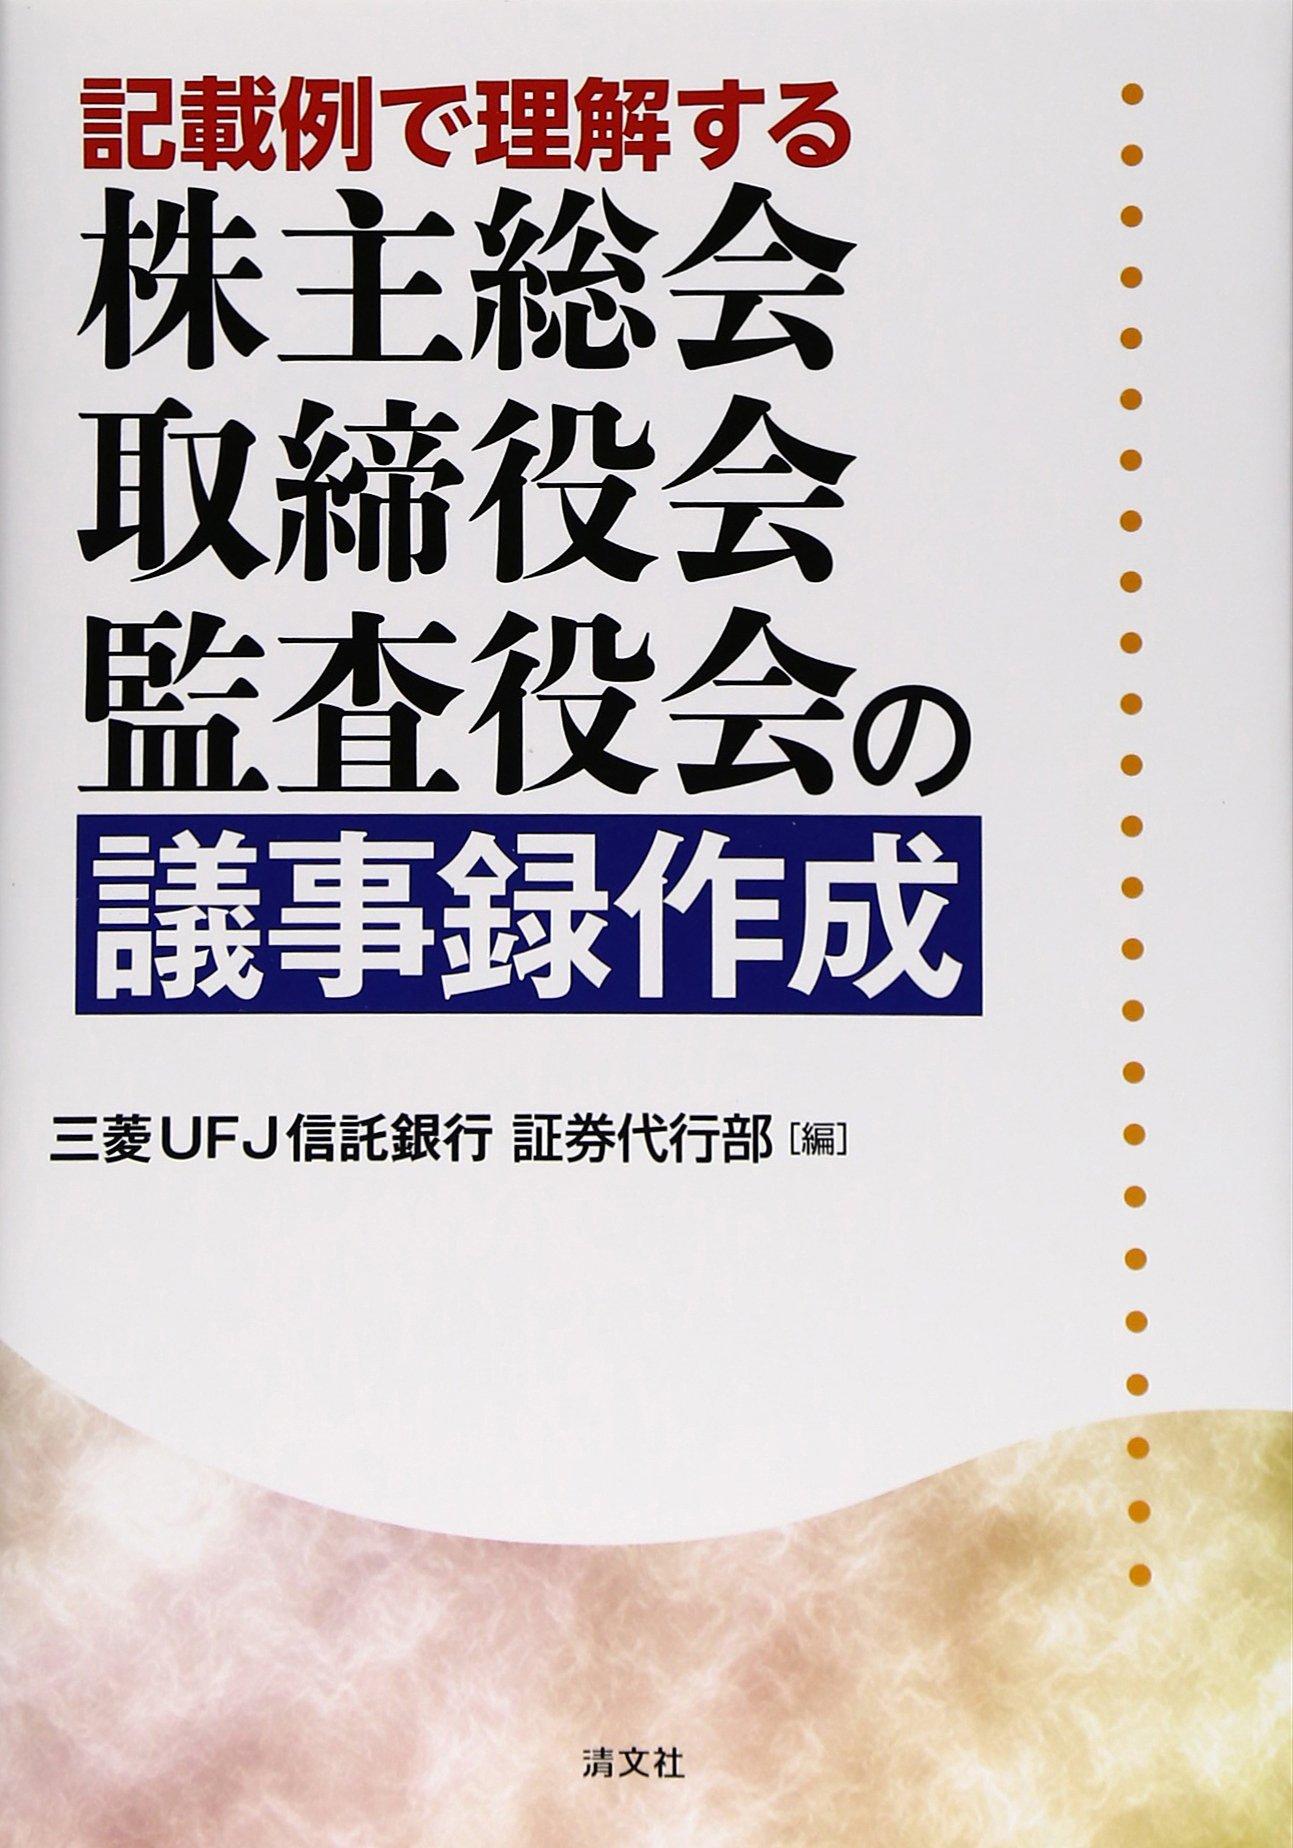 テレビ 事 取締役 会議 録 会議